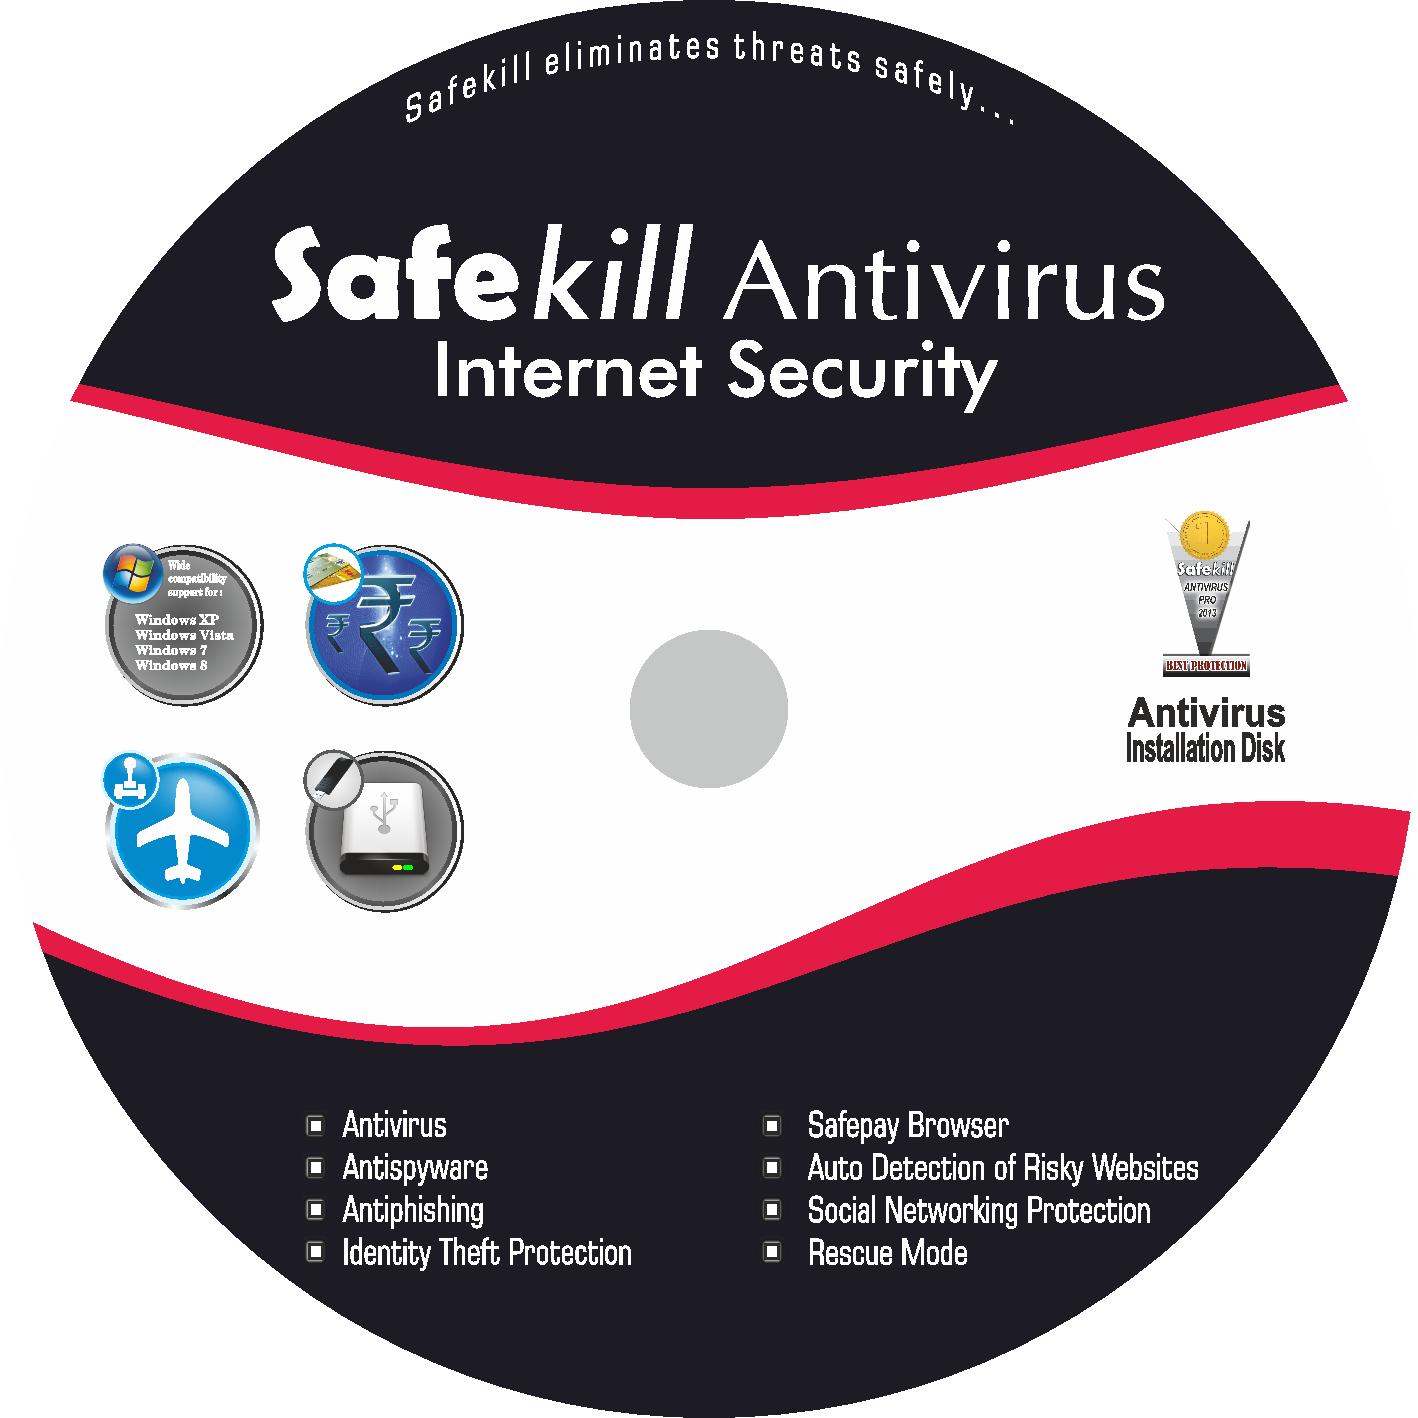 Safekill Antivirus (1 year / 1 User)